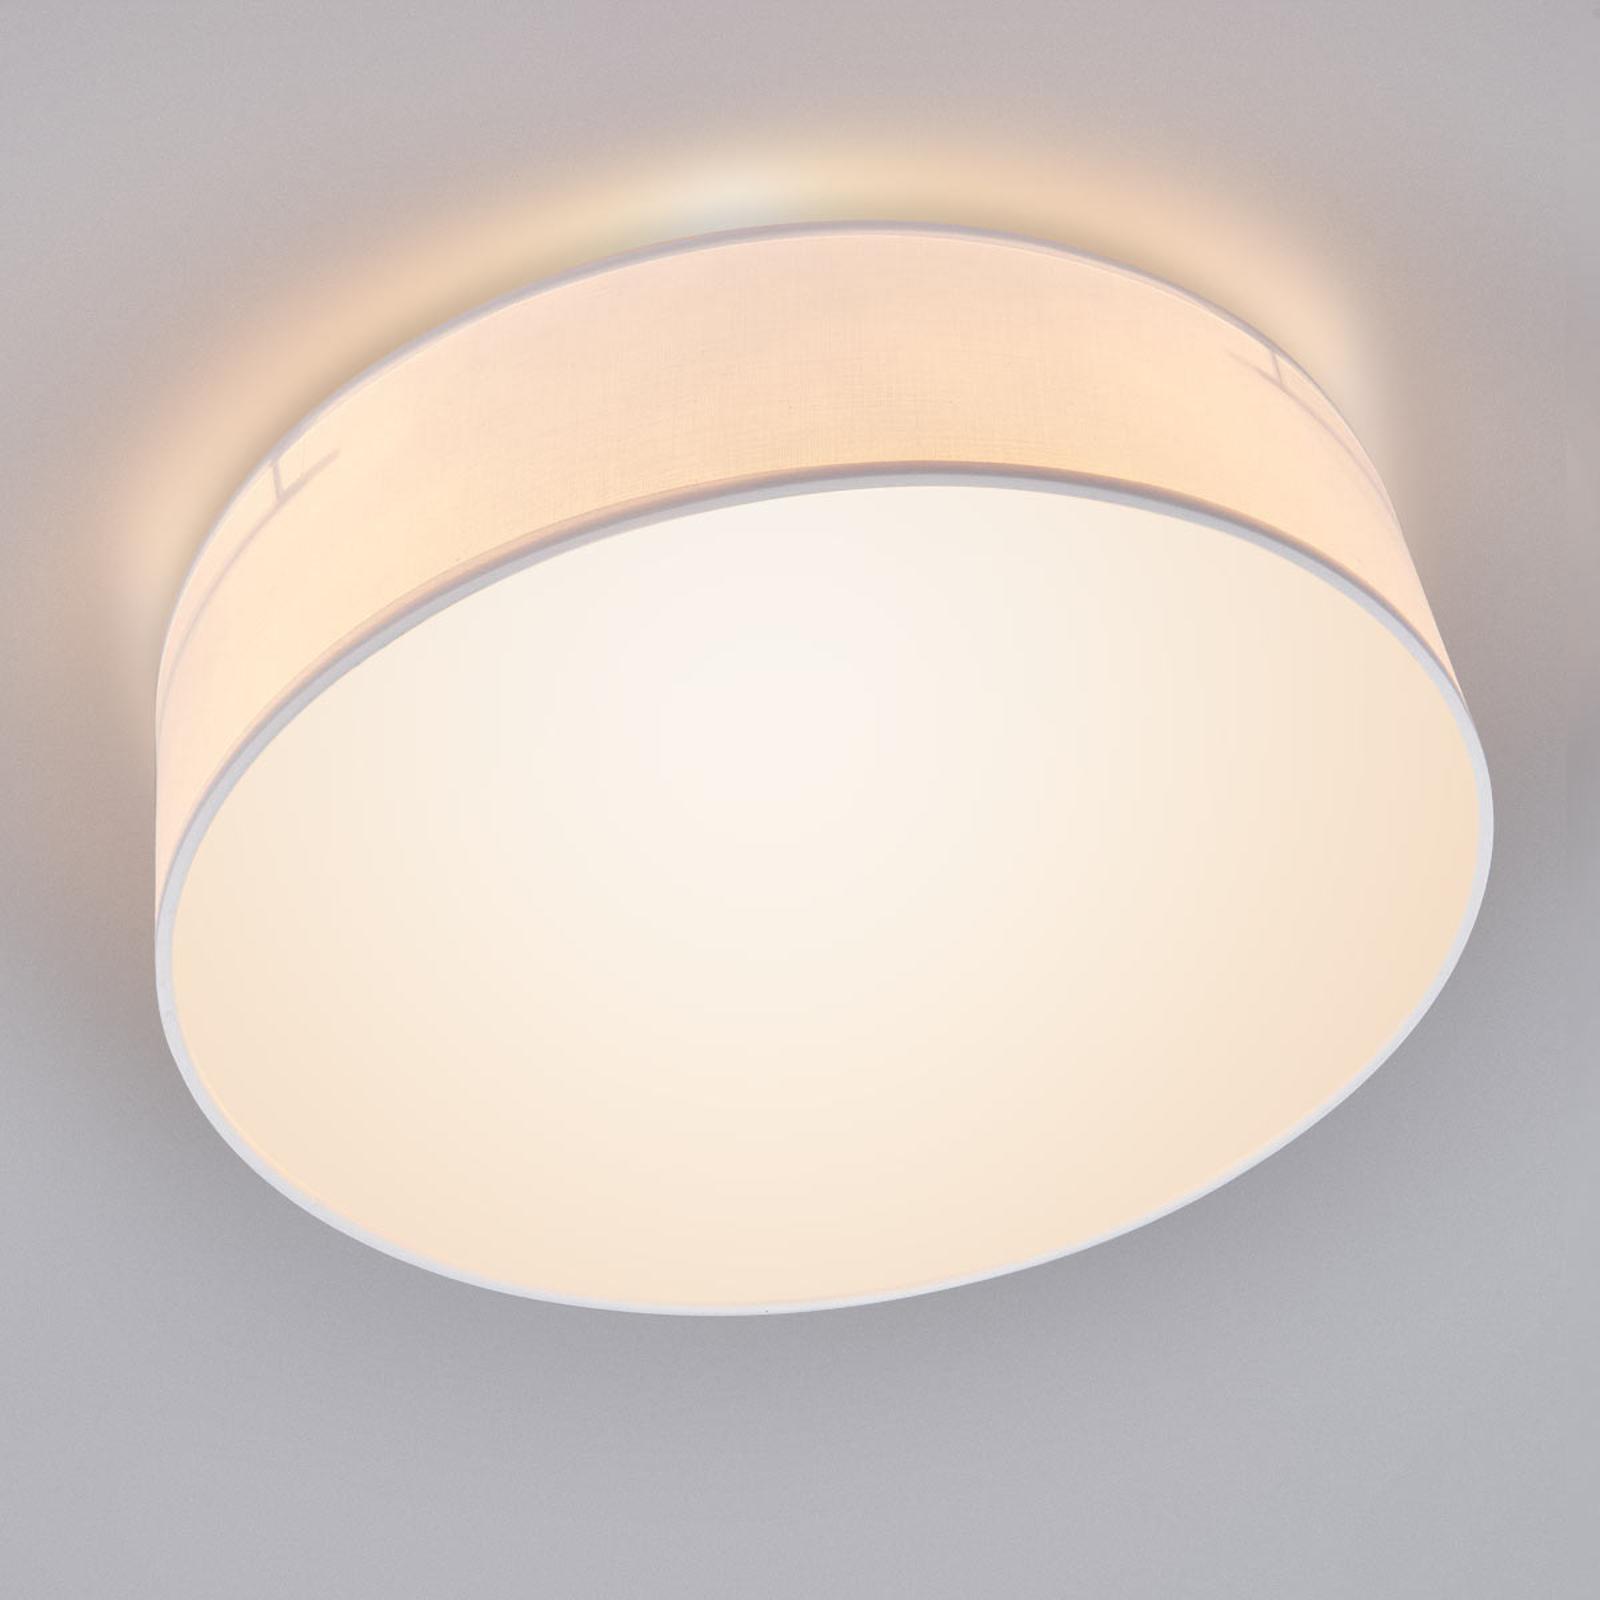 Biała lampa sufitowa CEILING DREAM, 40 cm